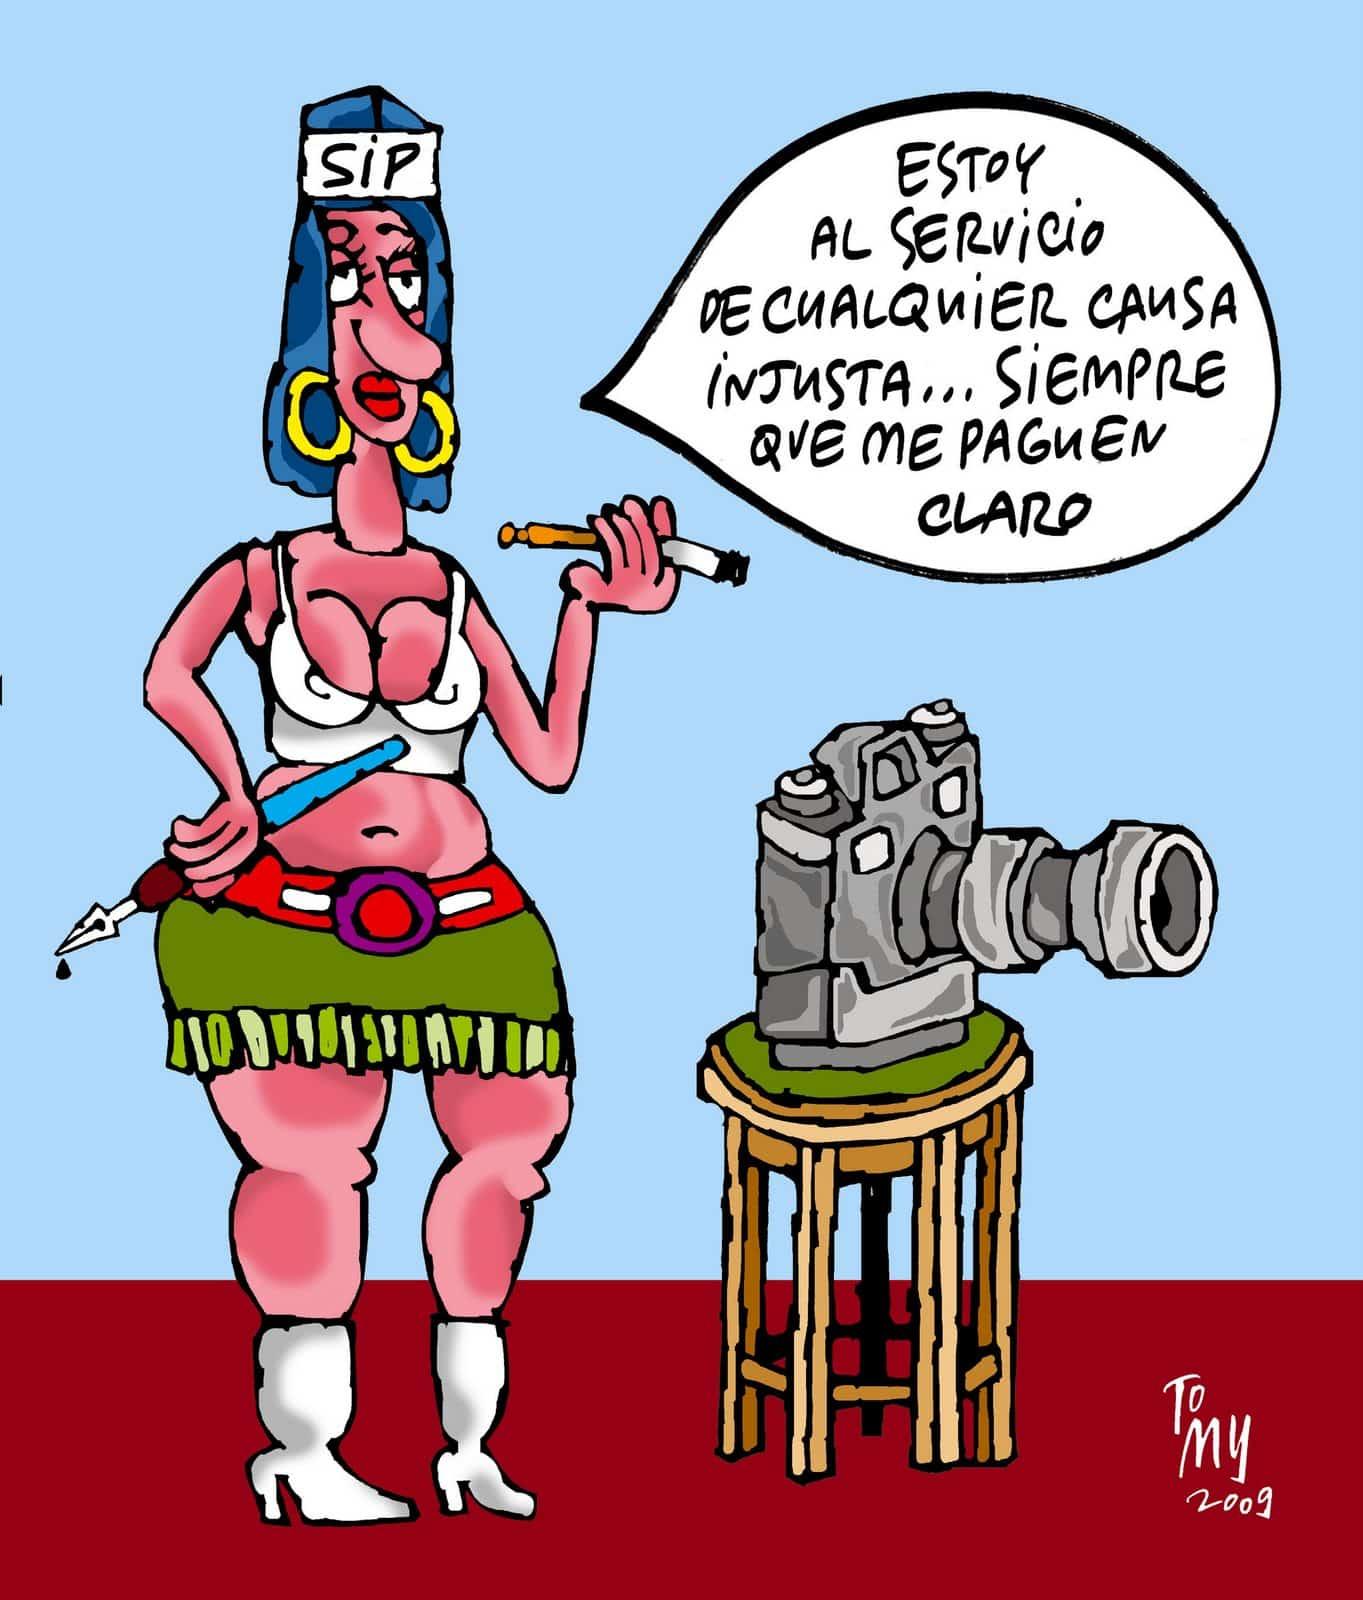 venezuelan american association: